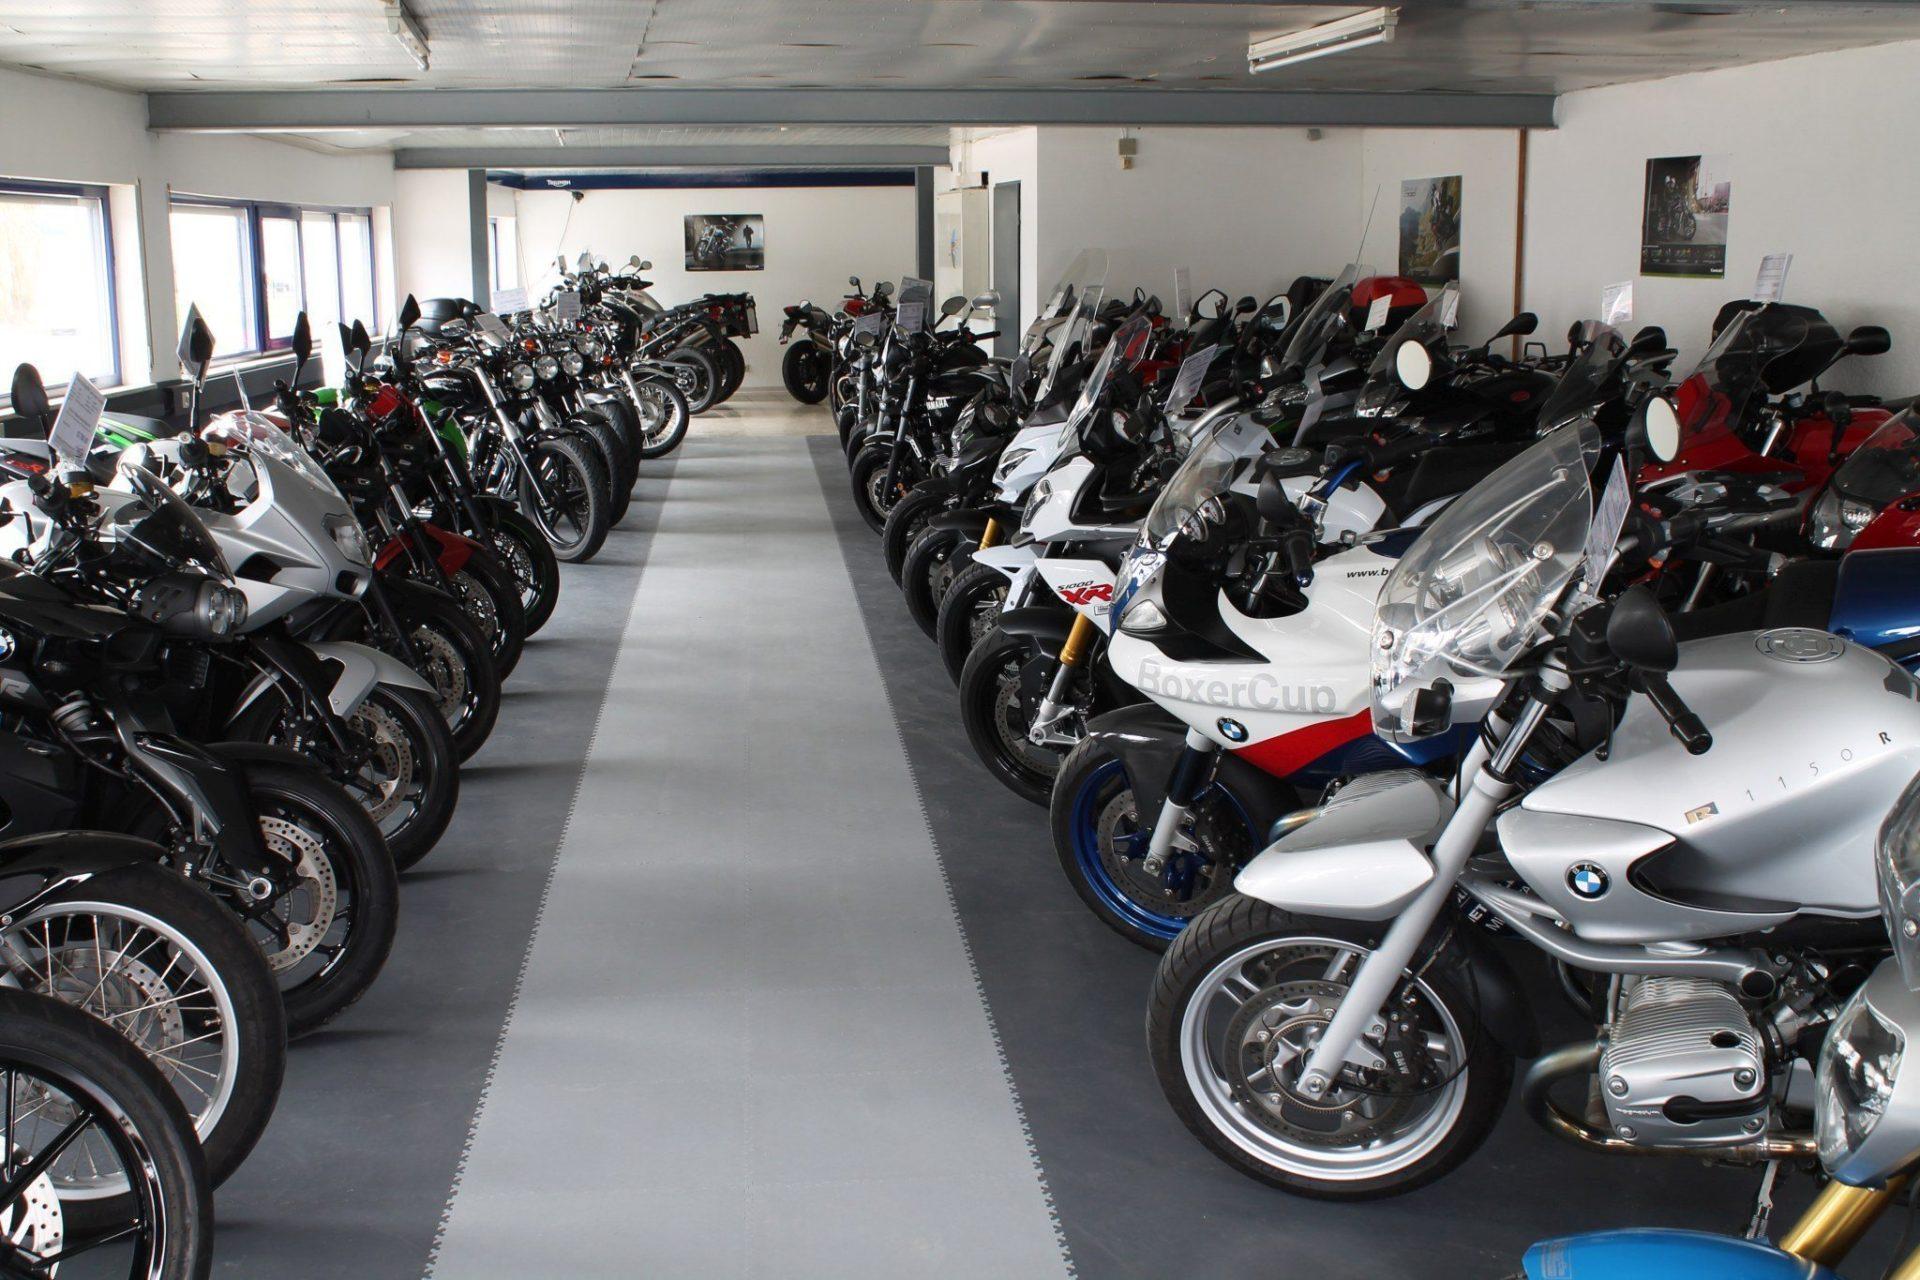 industrieboden-gewerbeboden-kfz-werkstatt-reifenservice-jp-mechanic-pvc-fliese-platte-garagen-autohändler-showroom-motorradshops